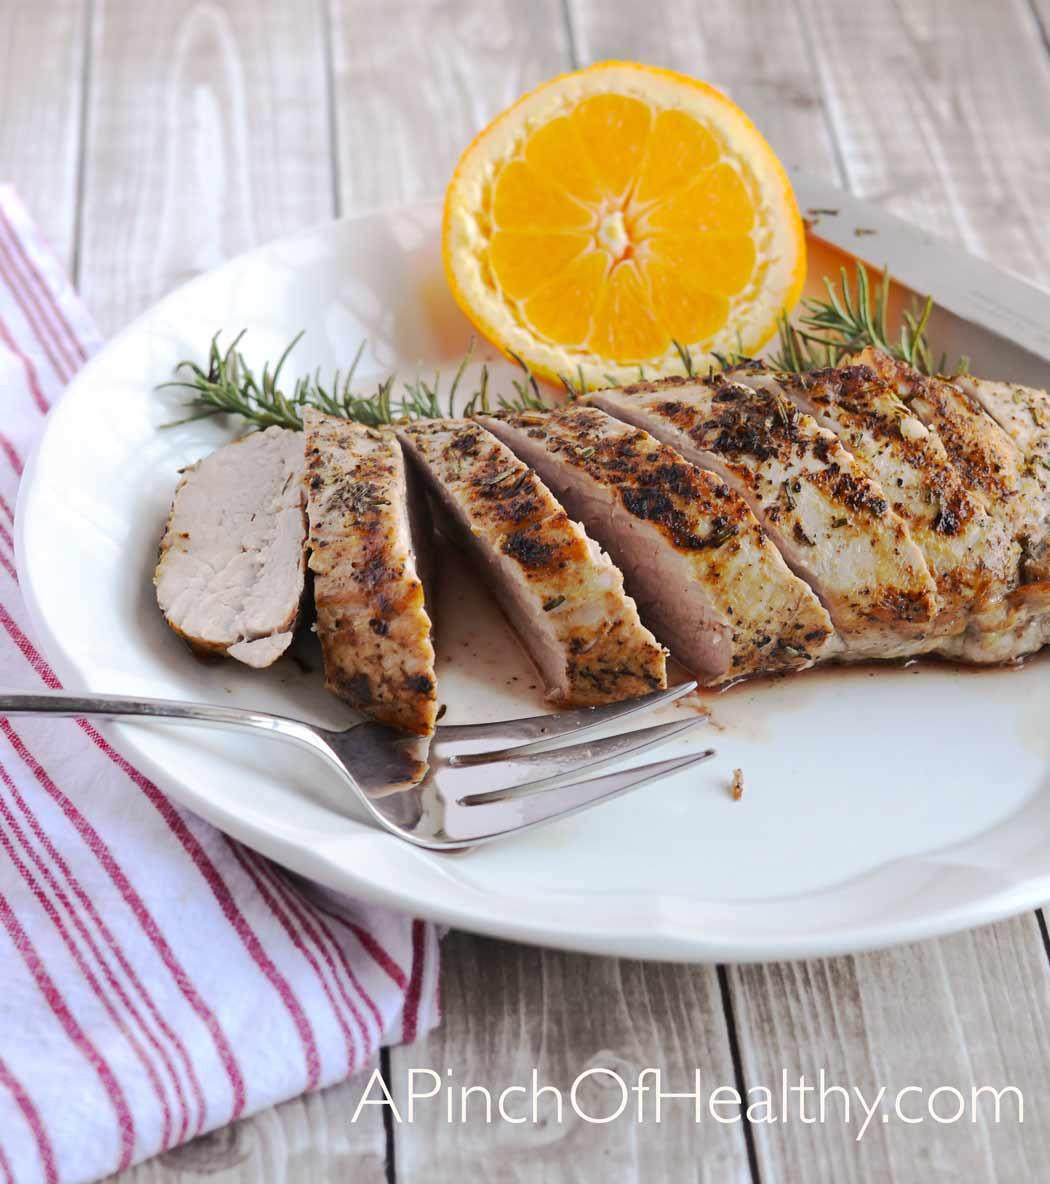 Healthy Pork Tenderloin Recipes  Grilled Pork Tenderloin on the Stovetop A Pinch of Healthy